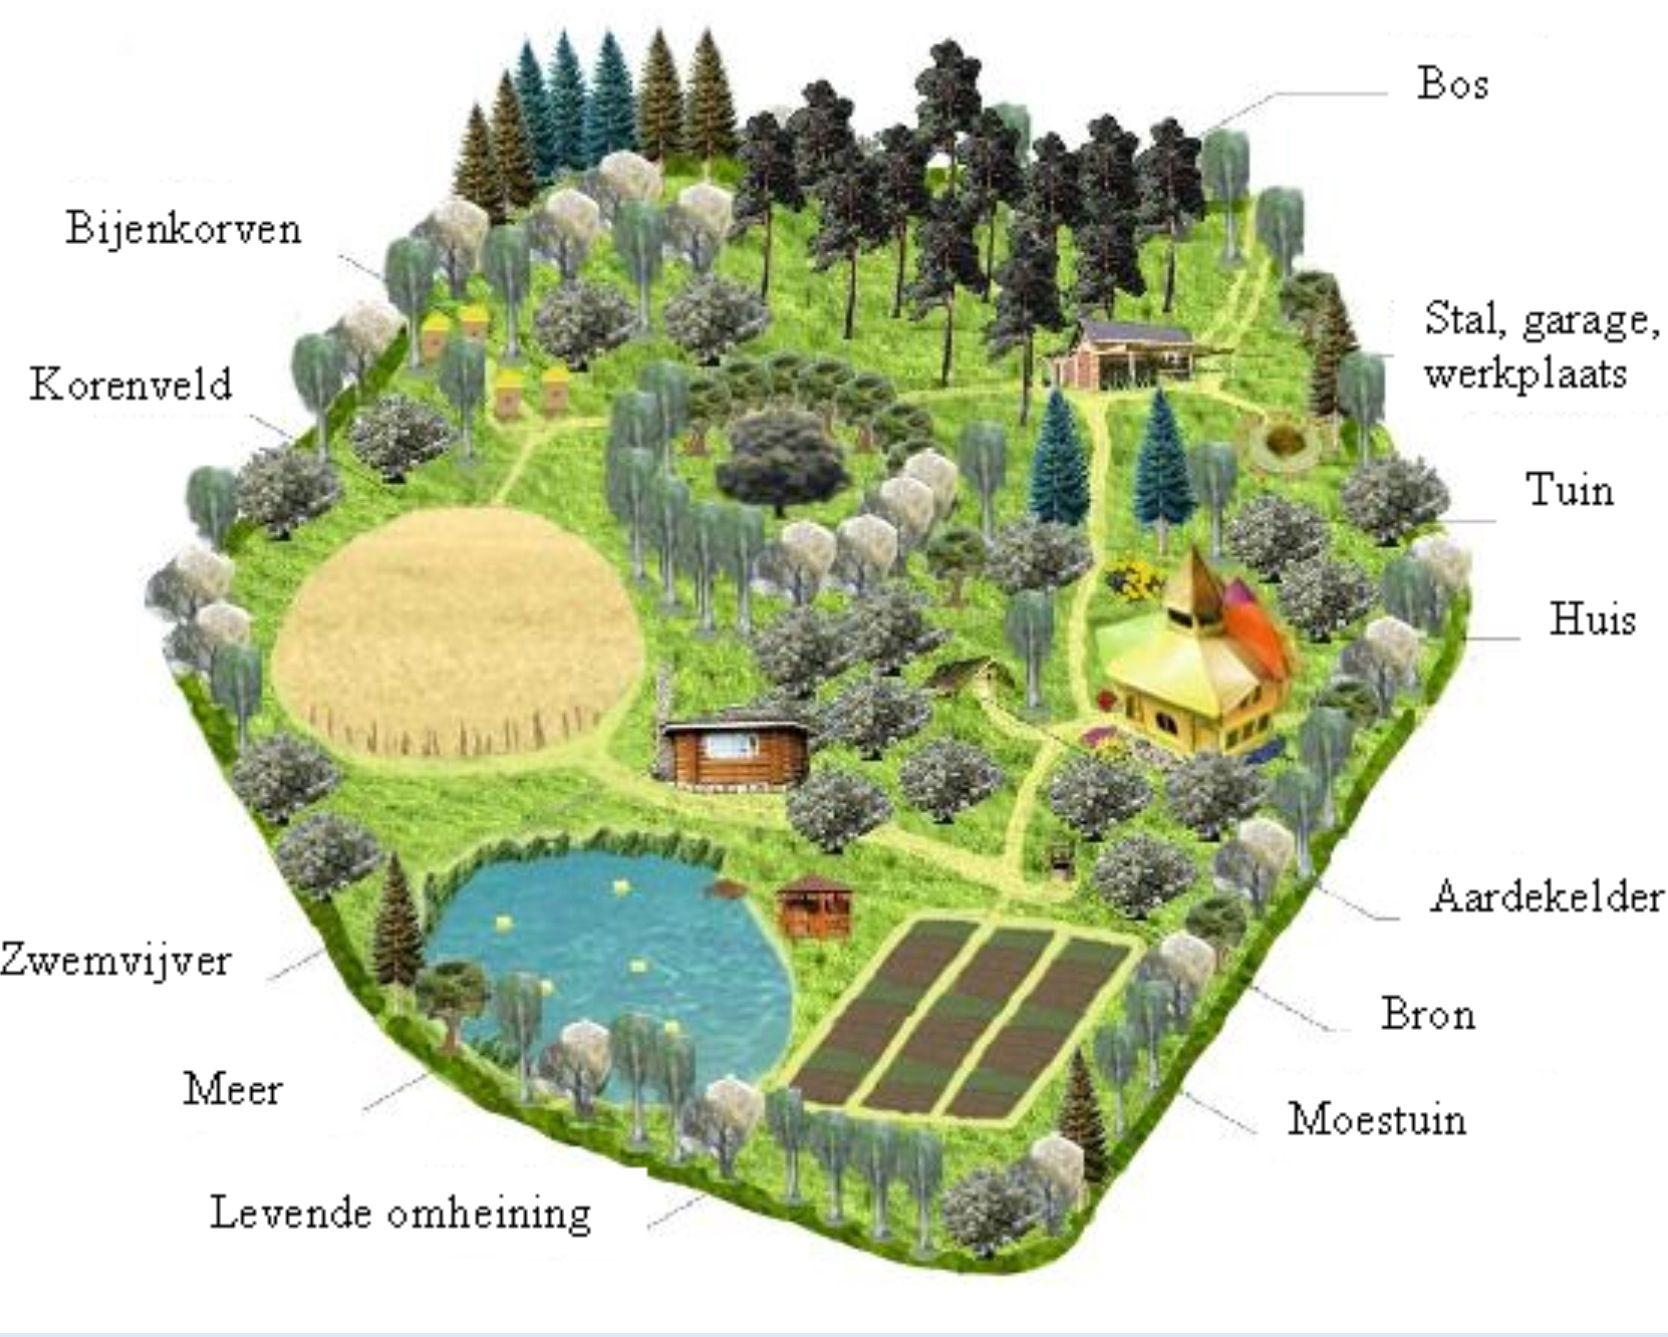 rivendel village perma garden | Permaculture, Permaculture ...